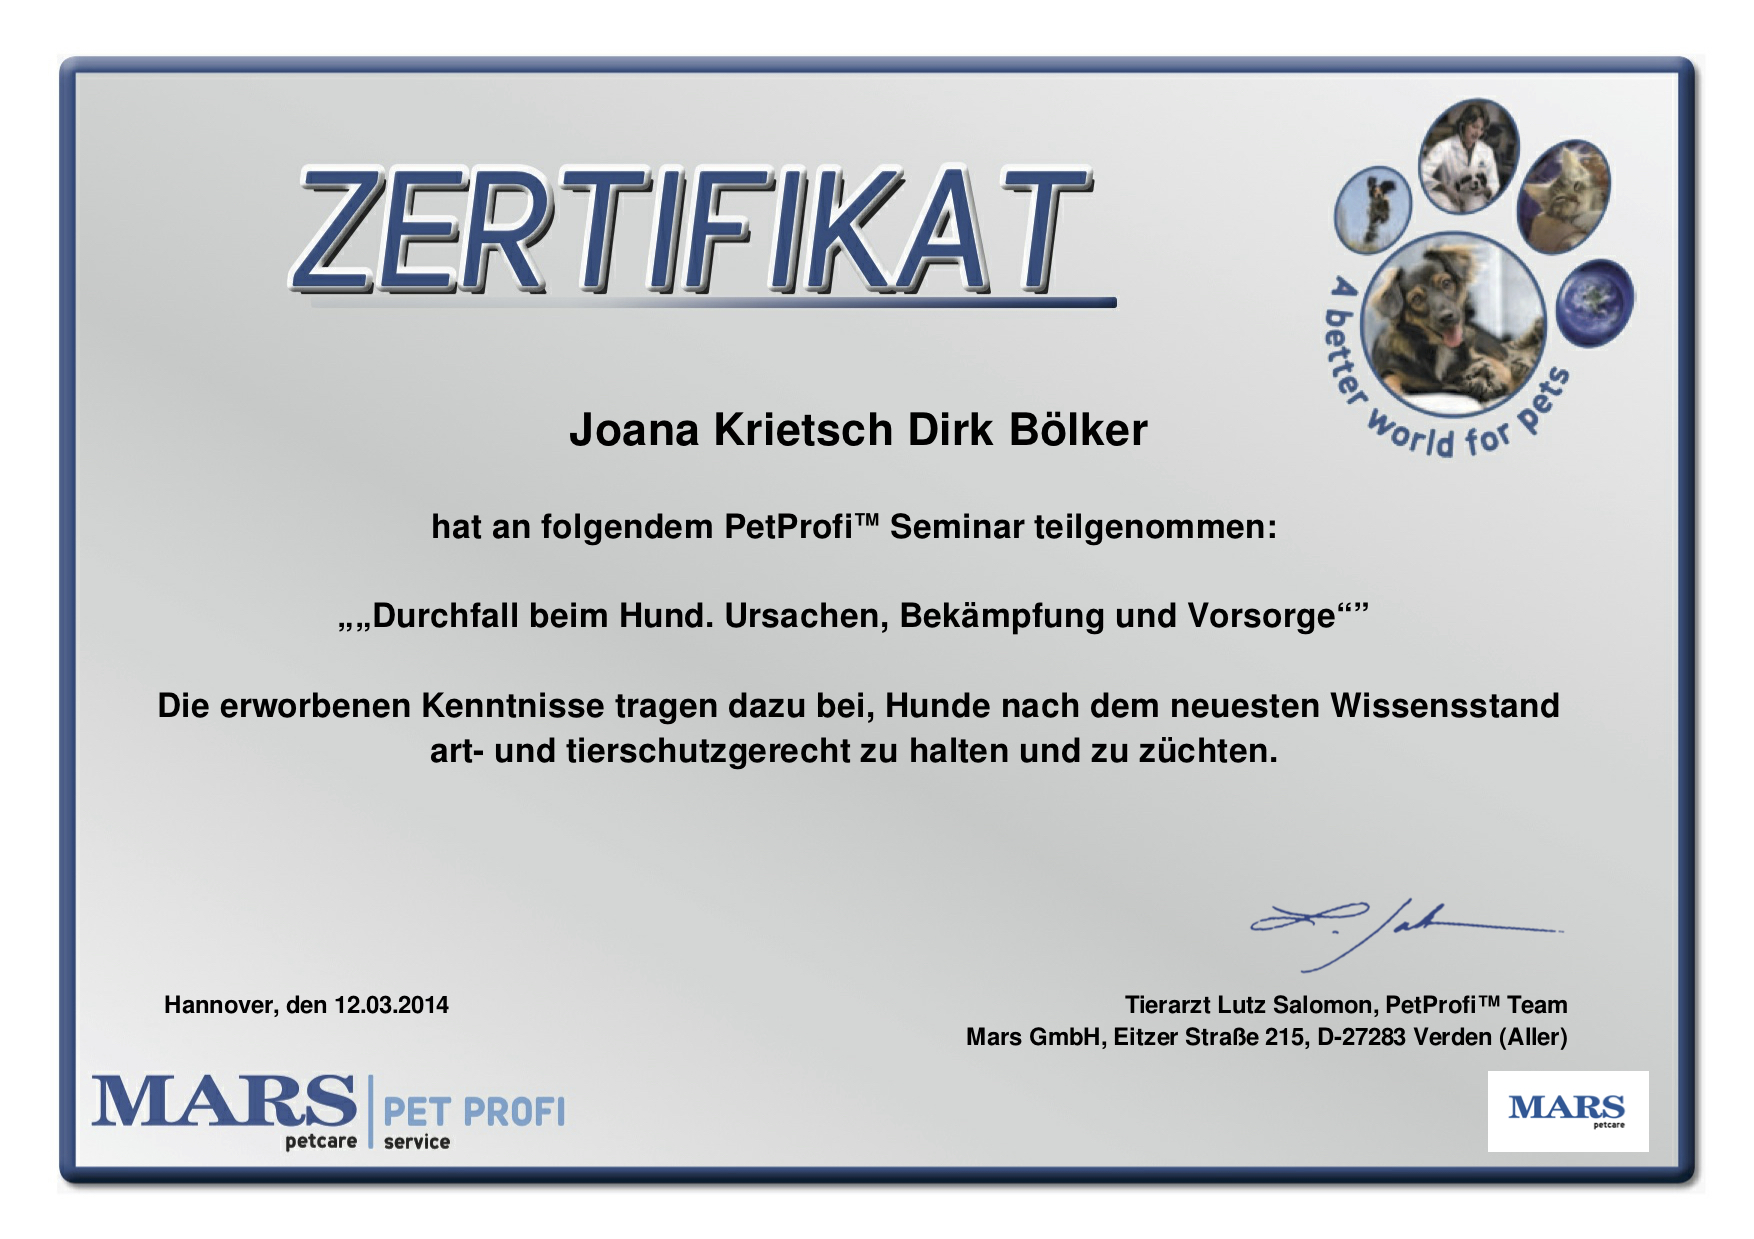 20180605-124911_Zertifikat